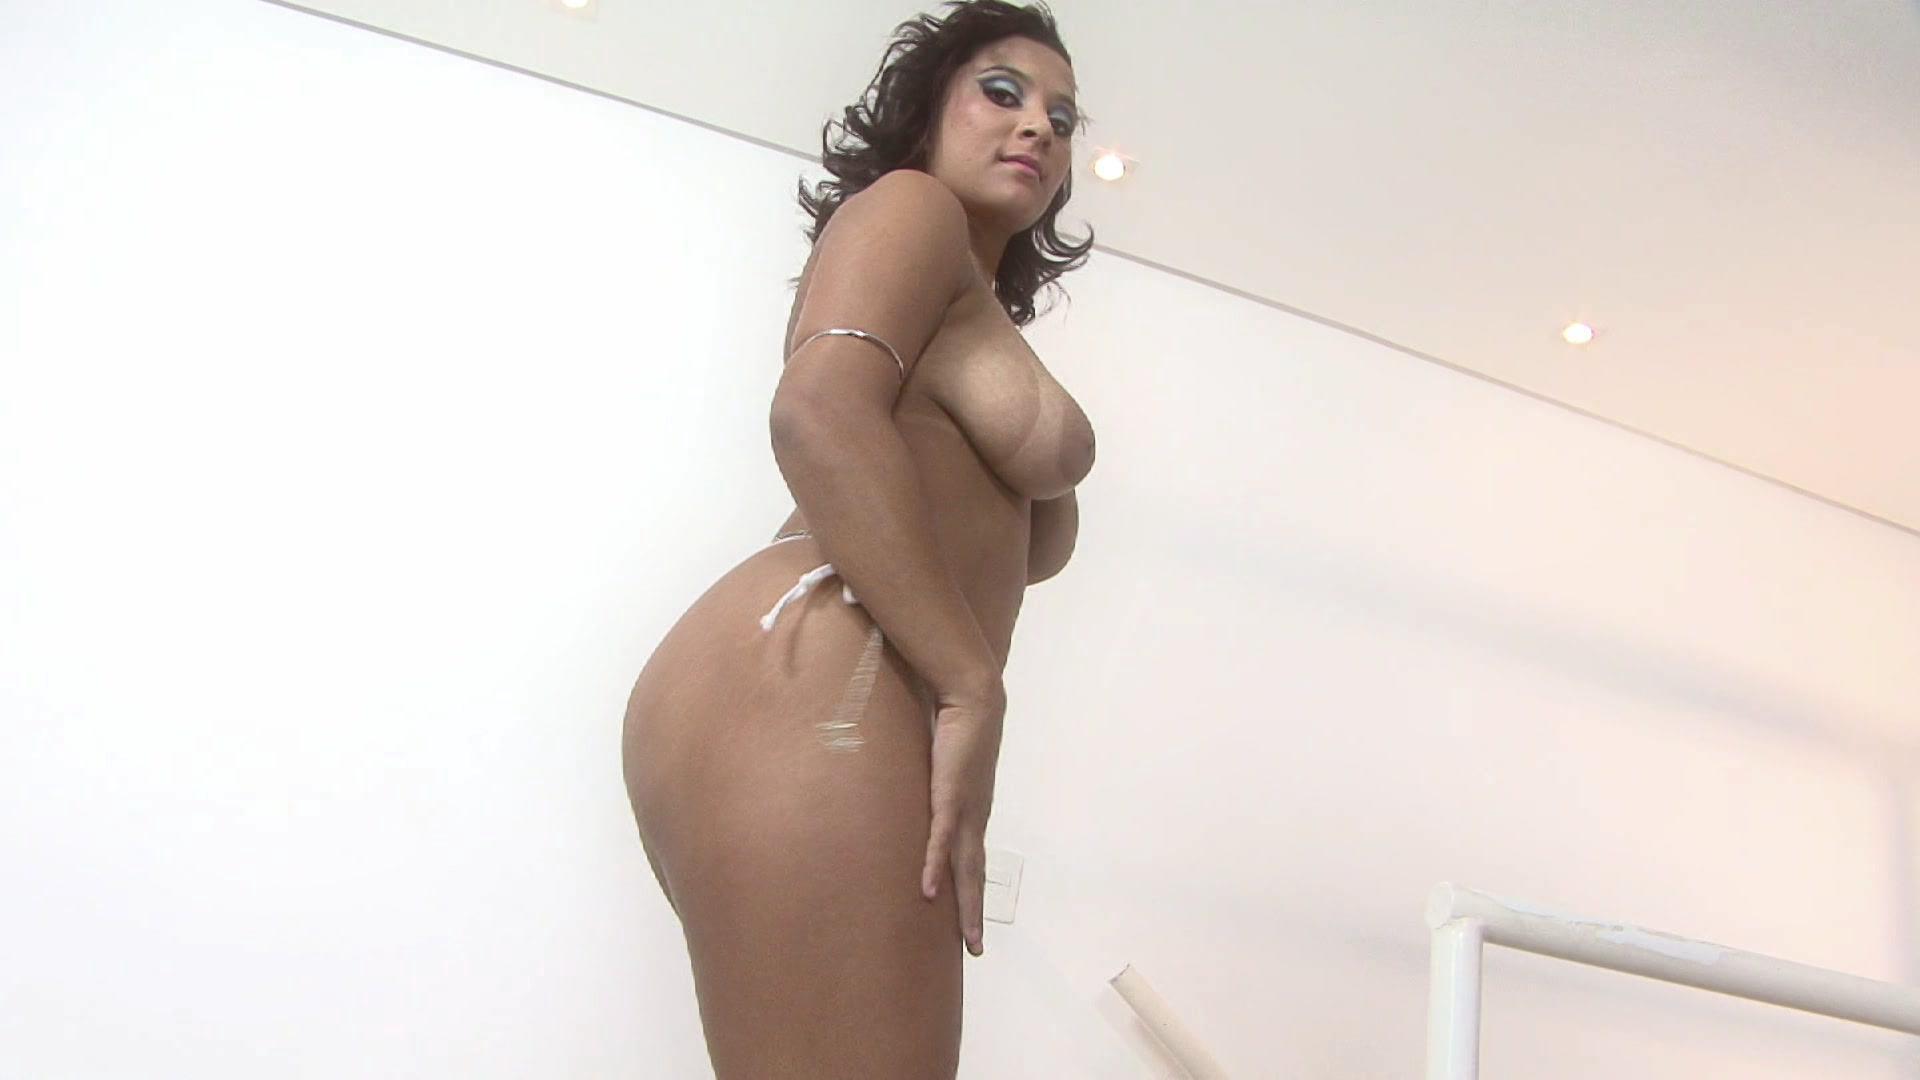 Anal Big Ass Xnxx big ass anal brazilian orgy «brazilians | free download nude